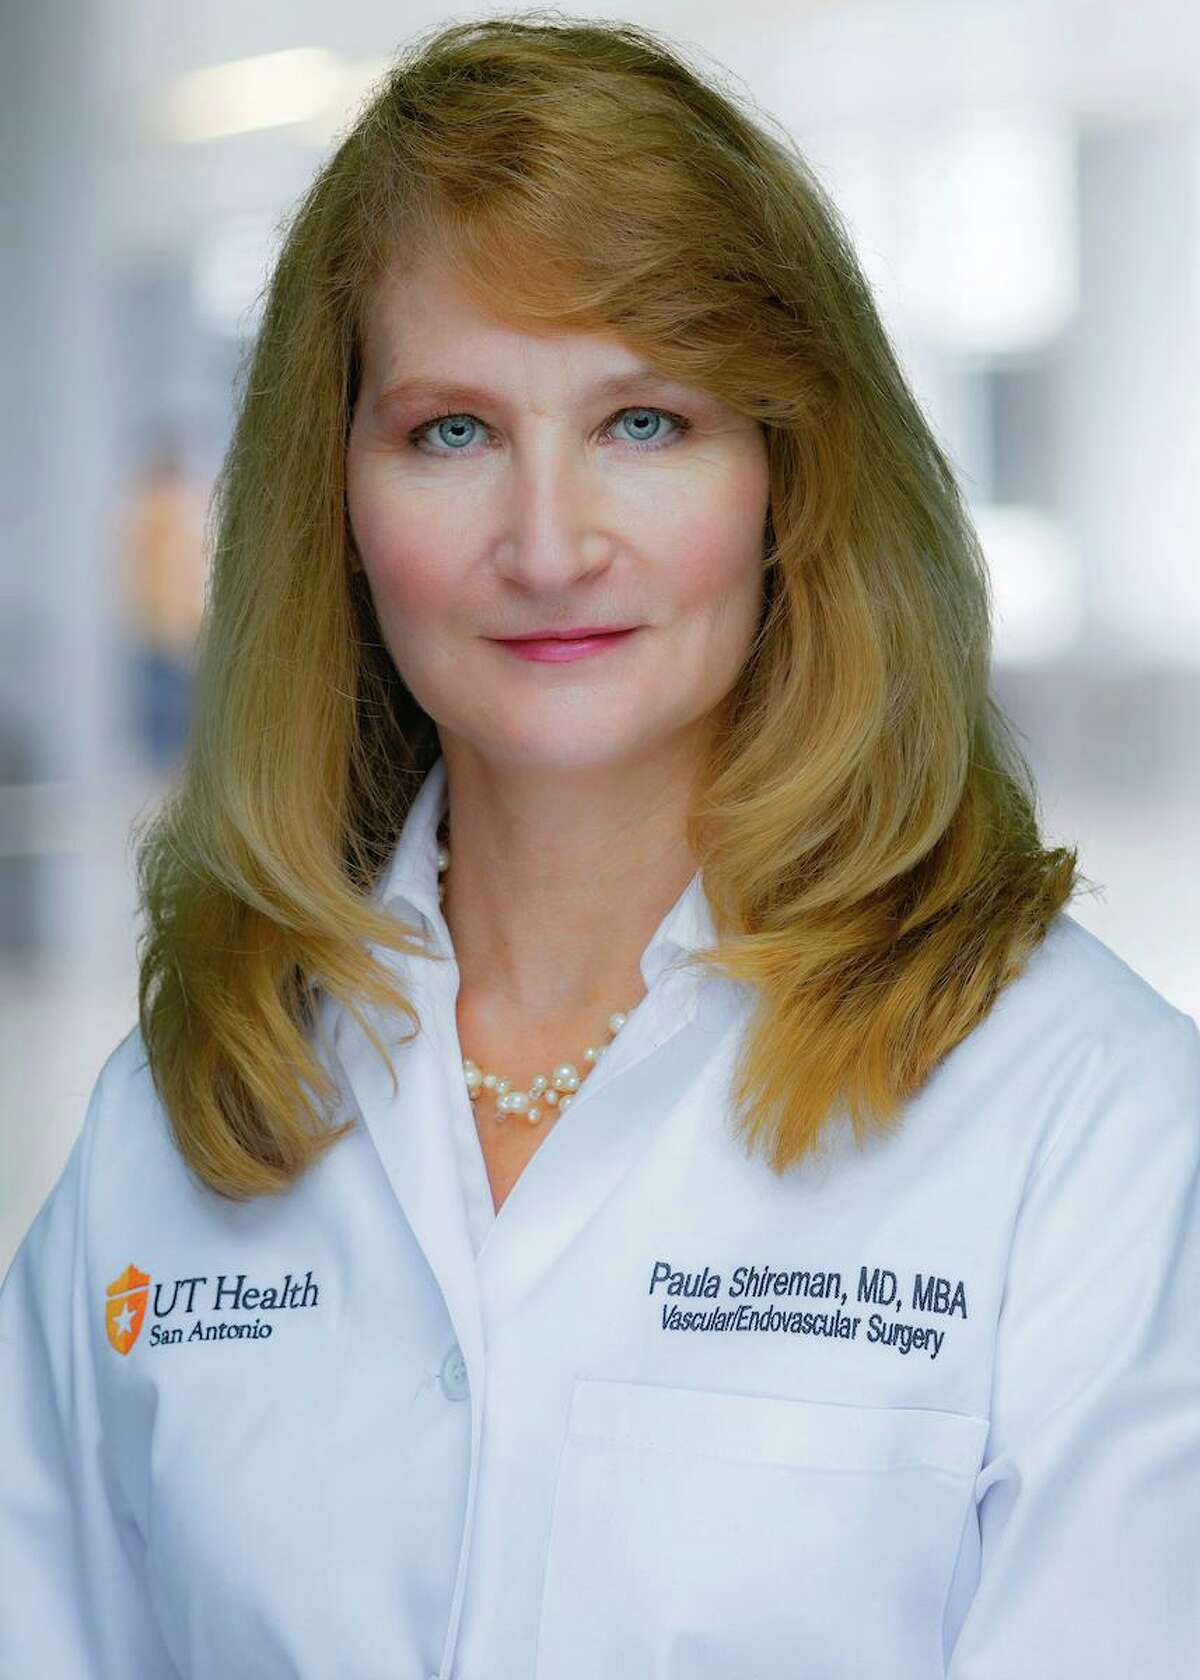 Dr. Paula Shireman is a vascular surgeon with UT Health San Antonio.